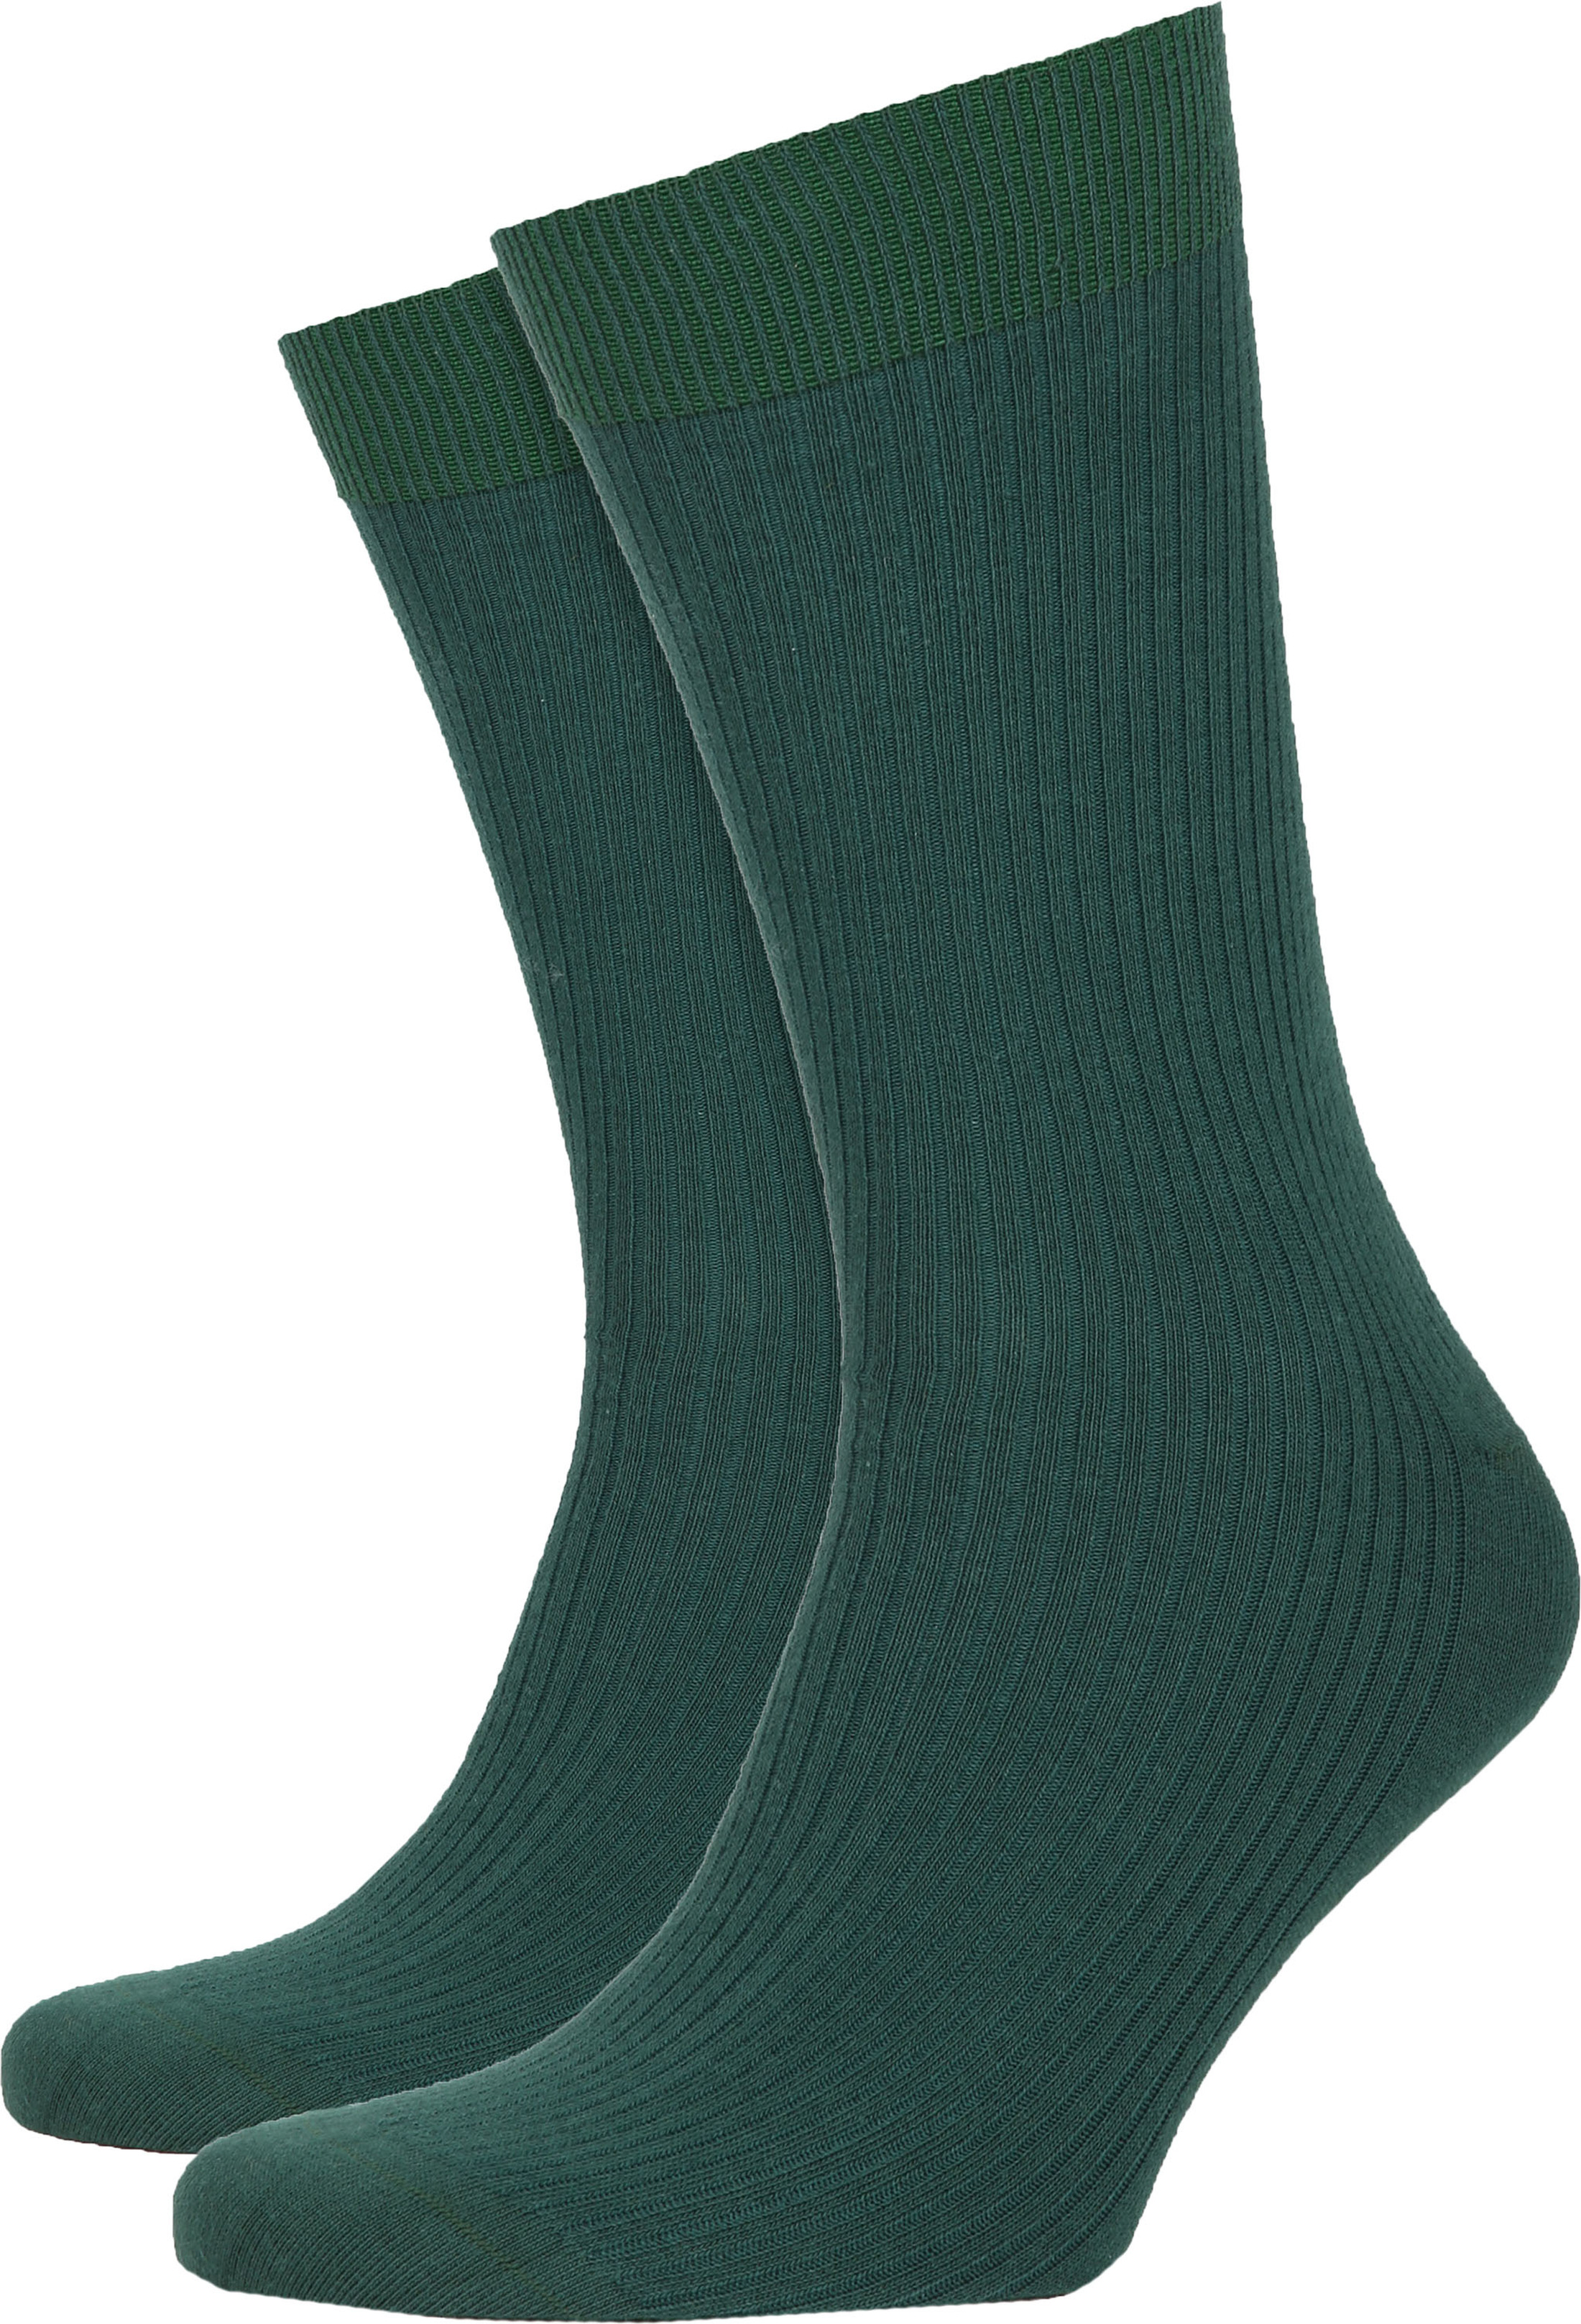 Colorful Standard Sokken Emerald